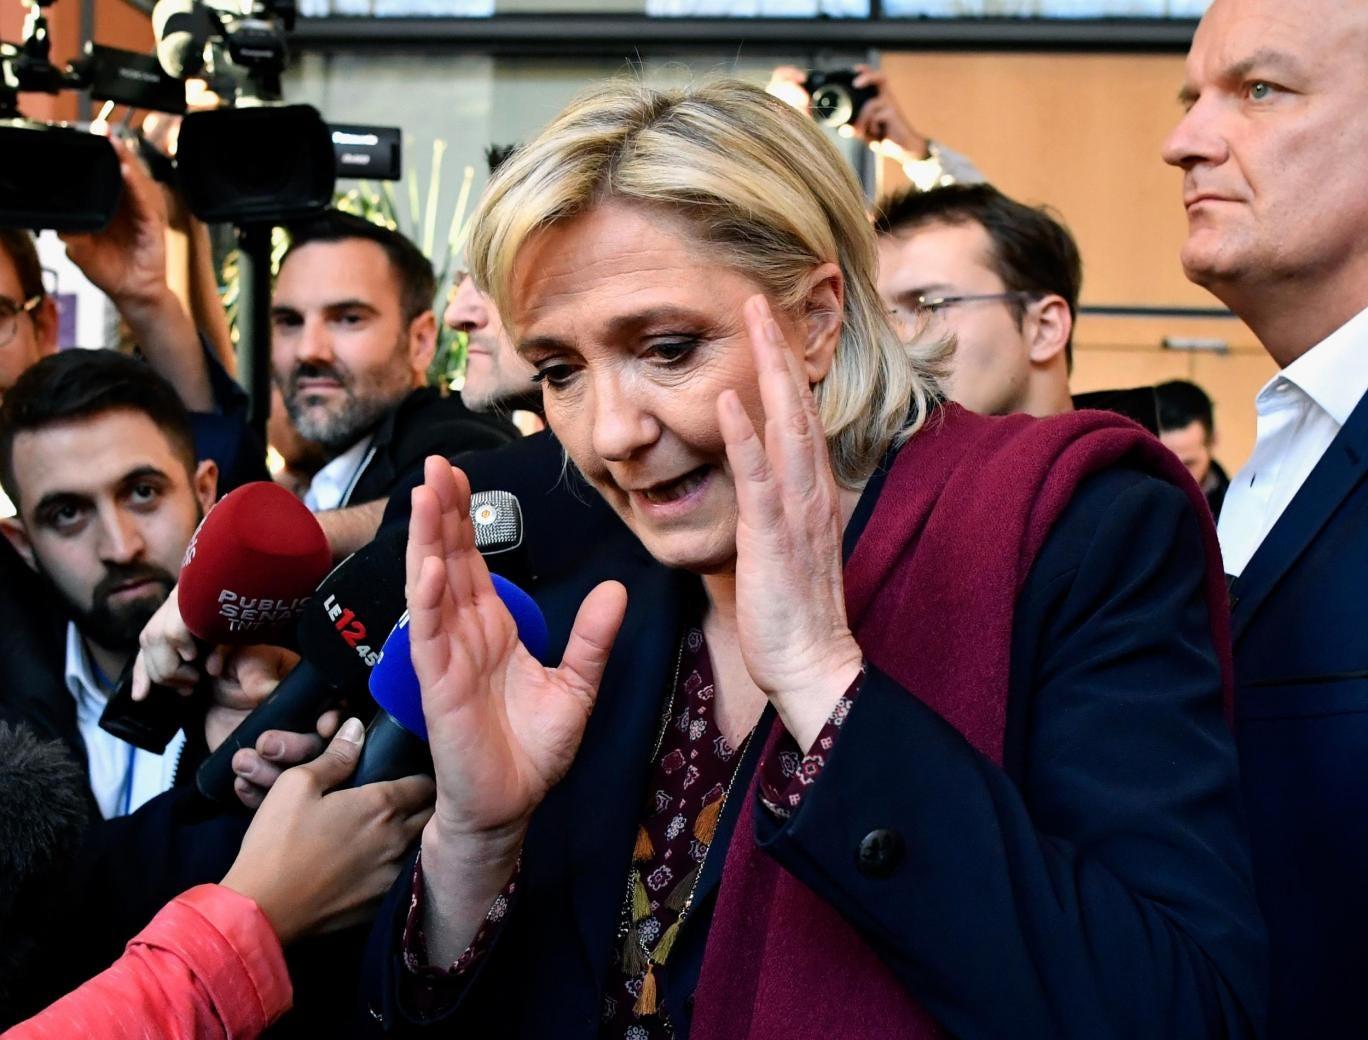 FEMEN bare in front of Marine Le Pen